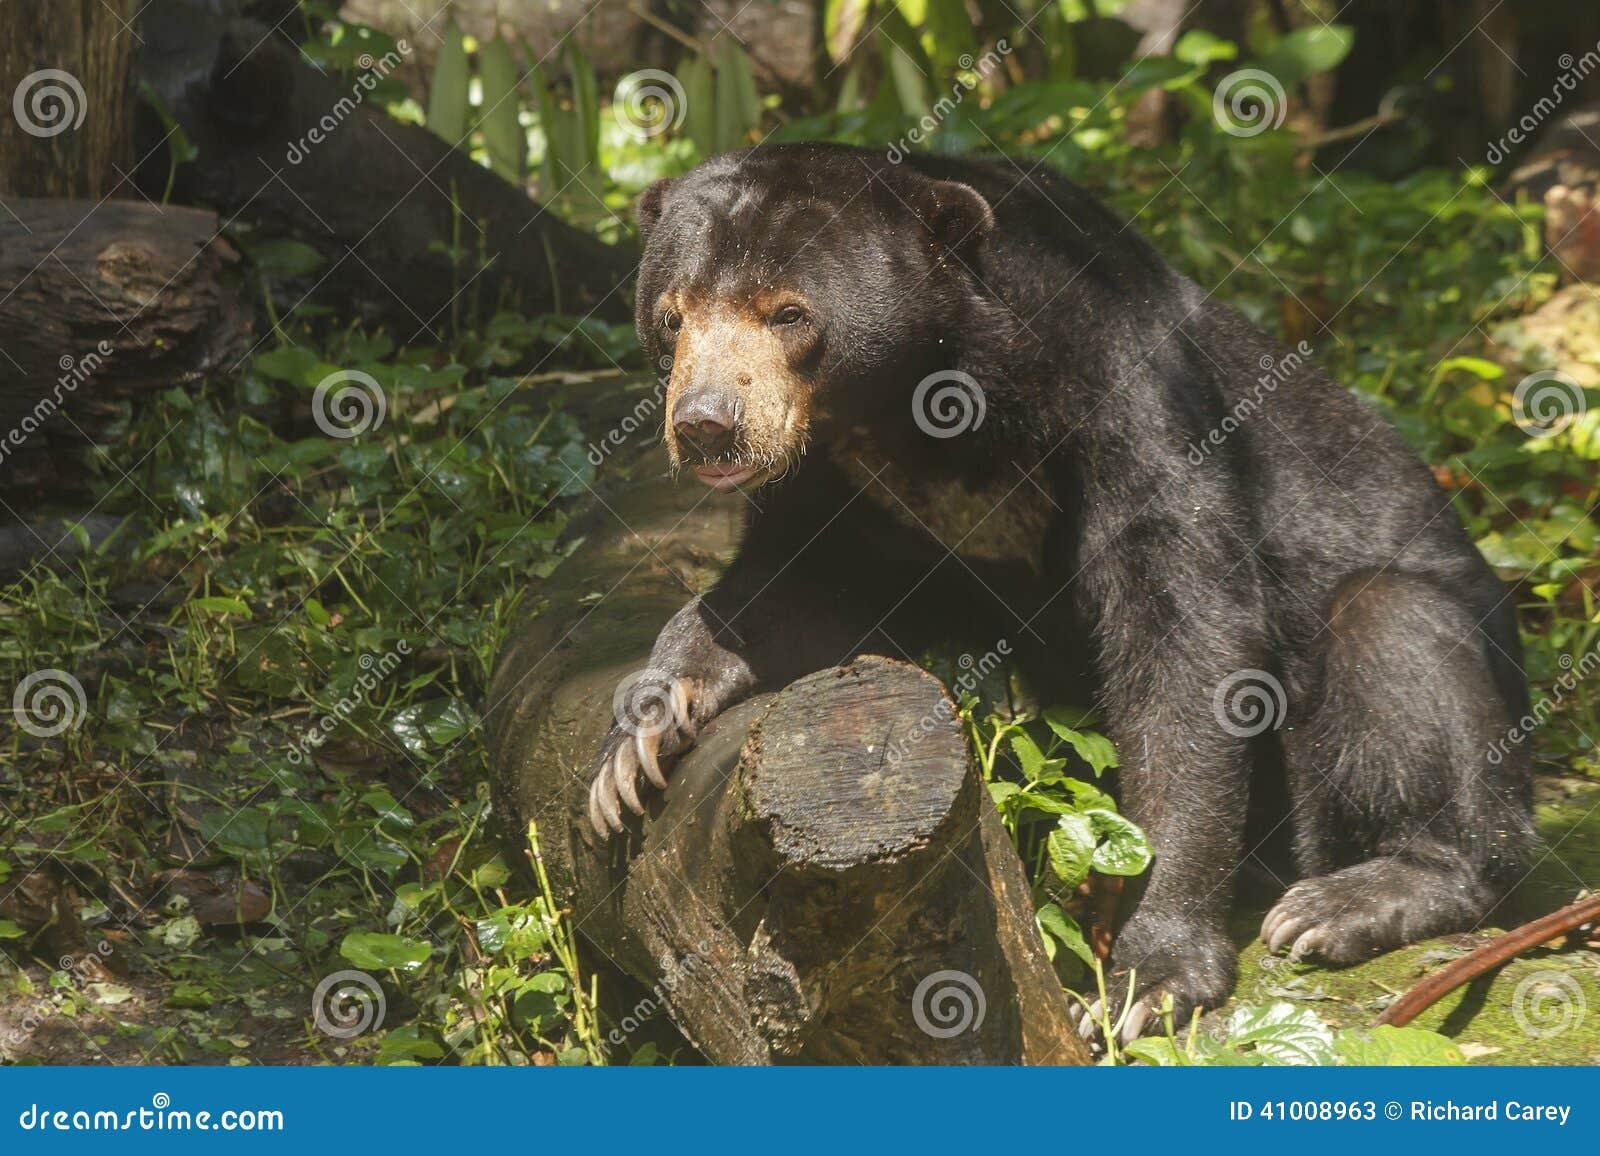 Sun Bear Stock Photo - Image: 41008963